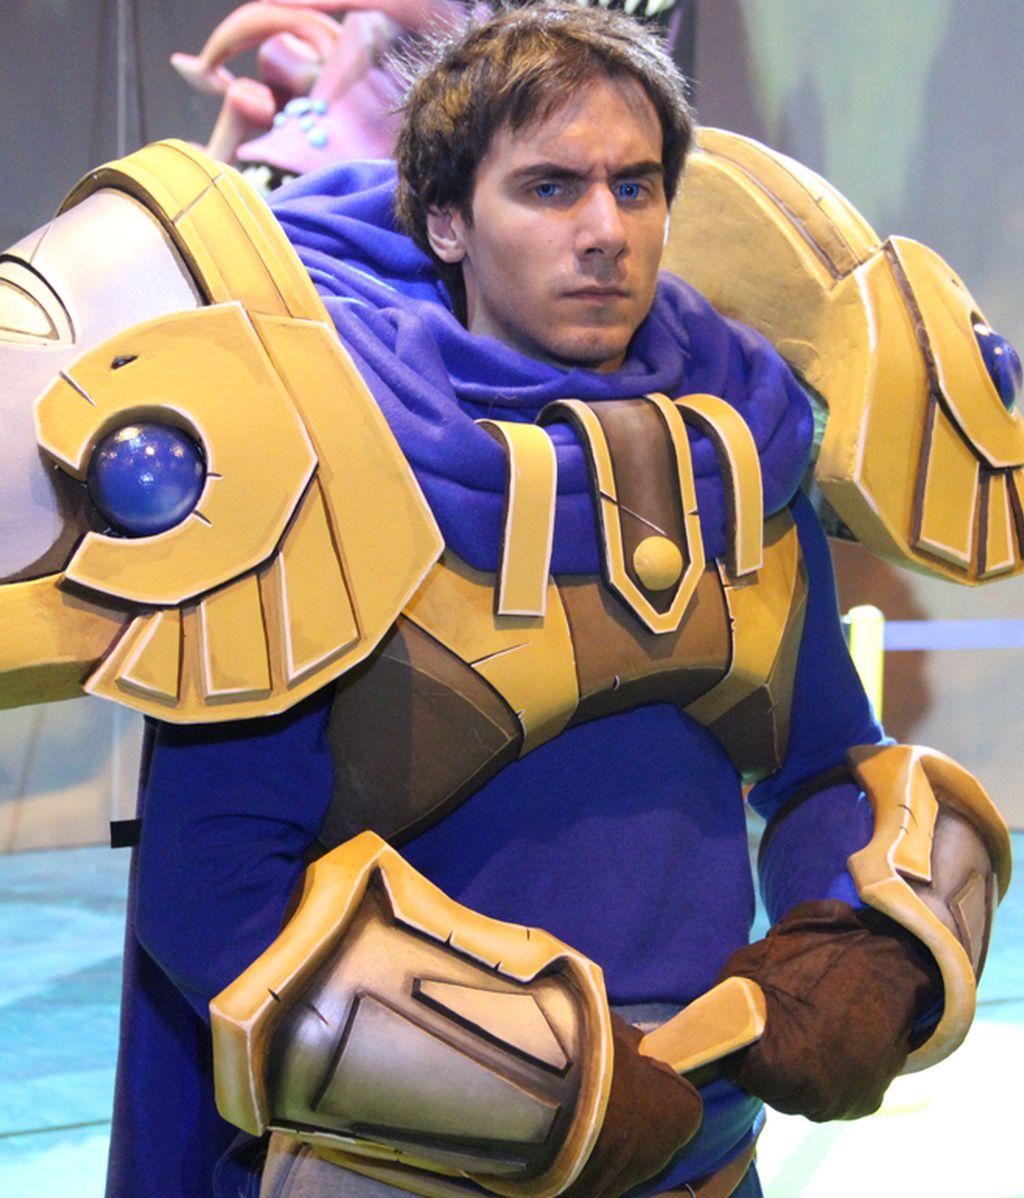 Garen, el valeroso guerrero del ejército de Demacia